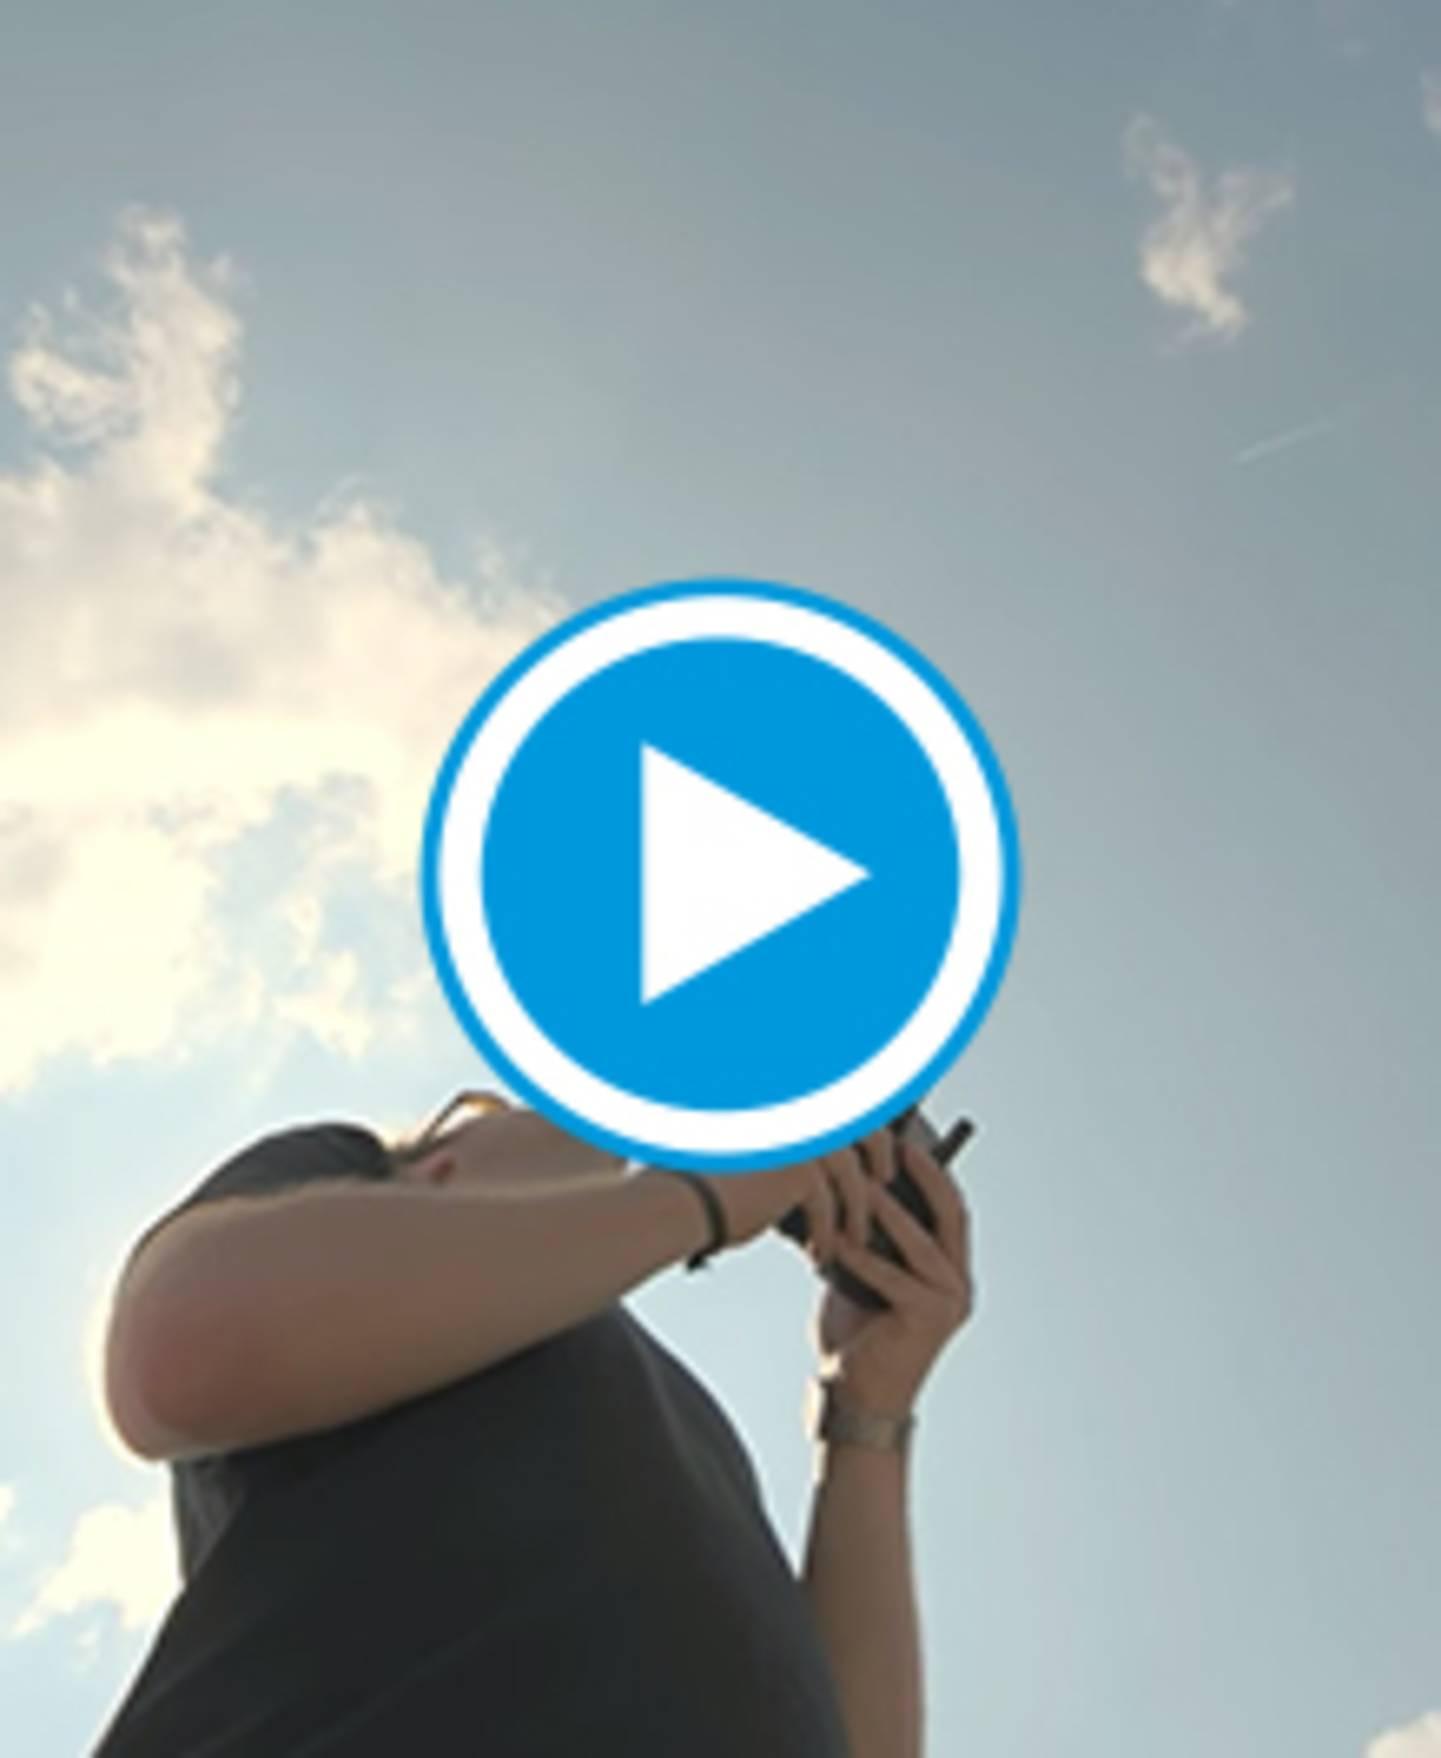 MantisQ - faltbare Kameradrohne - Video Point of Interest